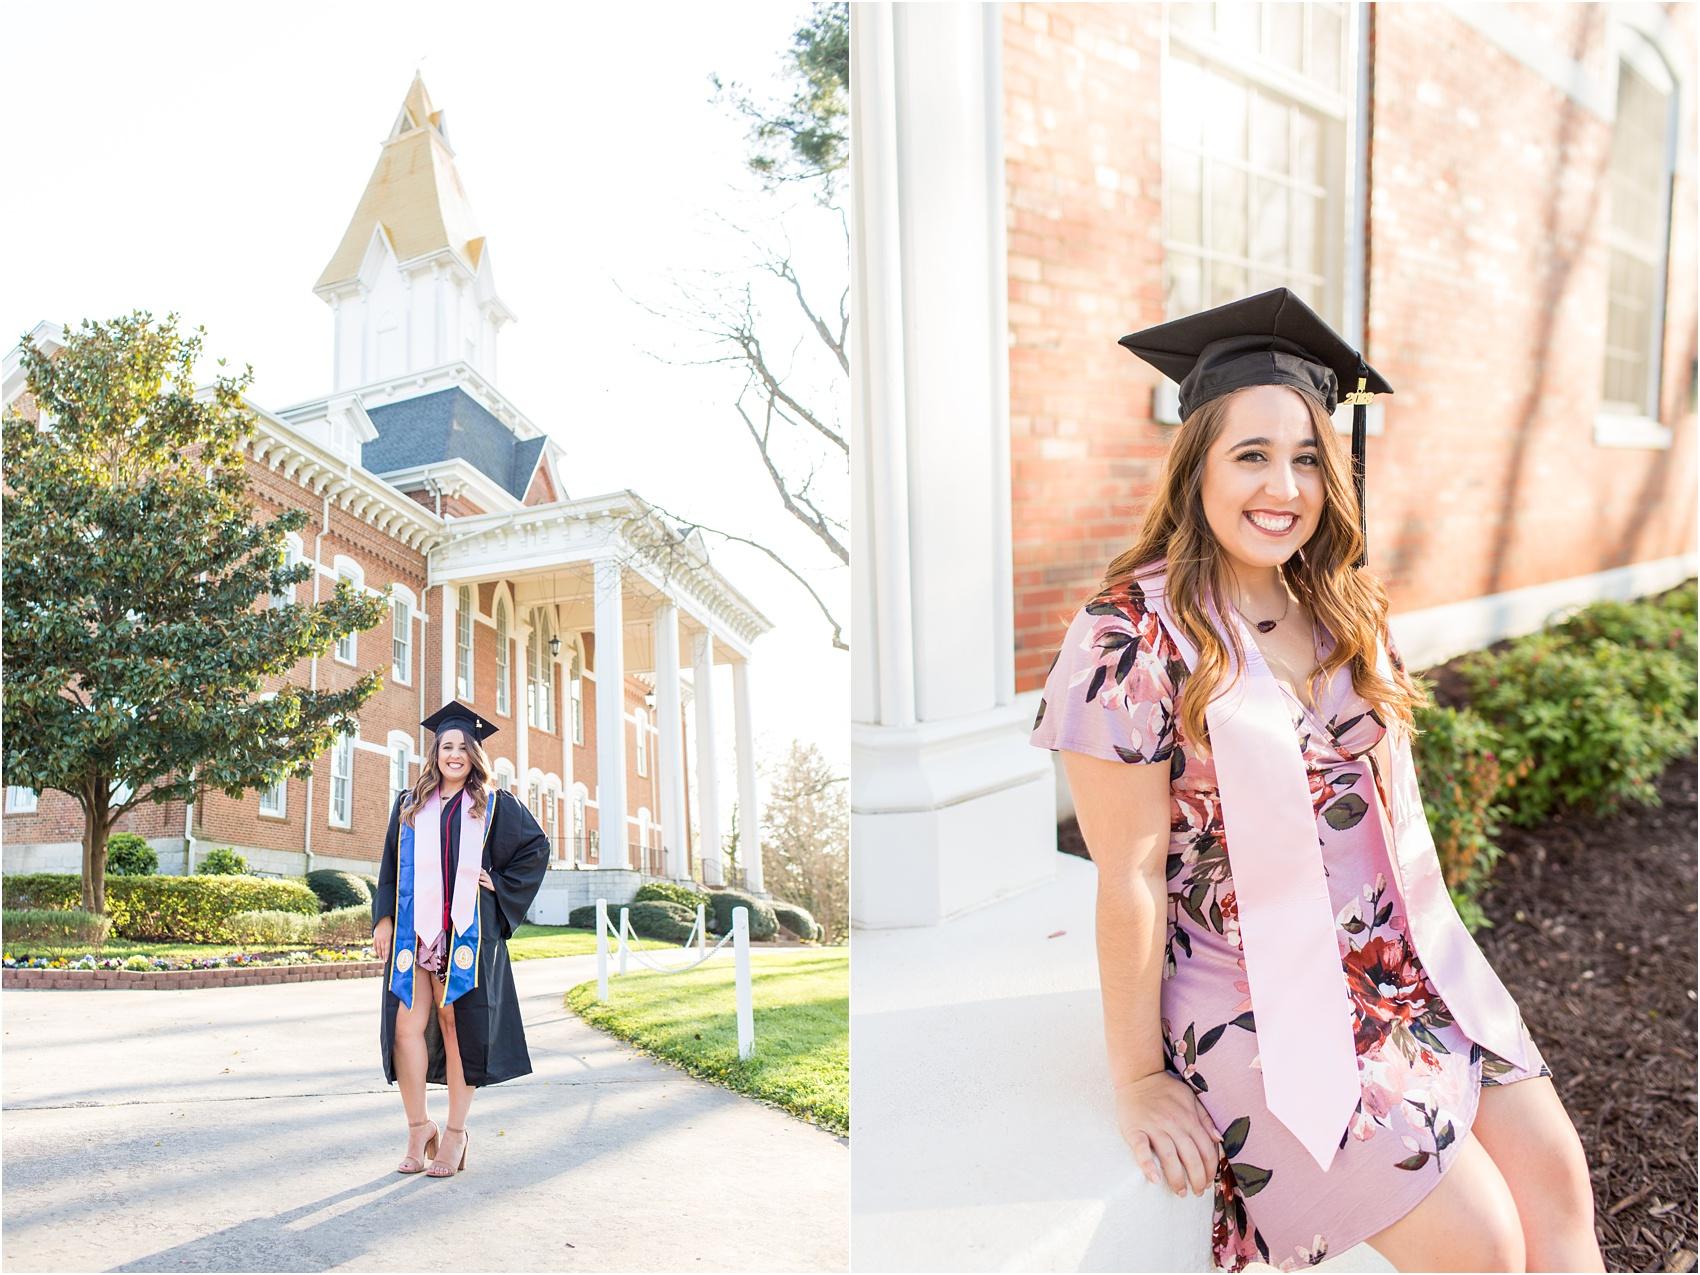 Savannah Eve Photography- Courtney & Allison- UNG Class of 2018-16.jpg